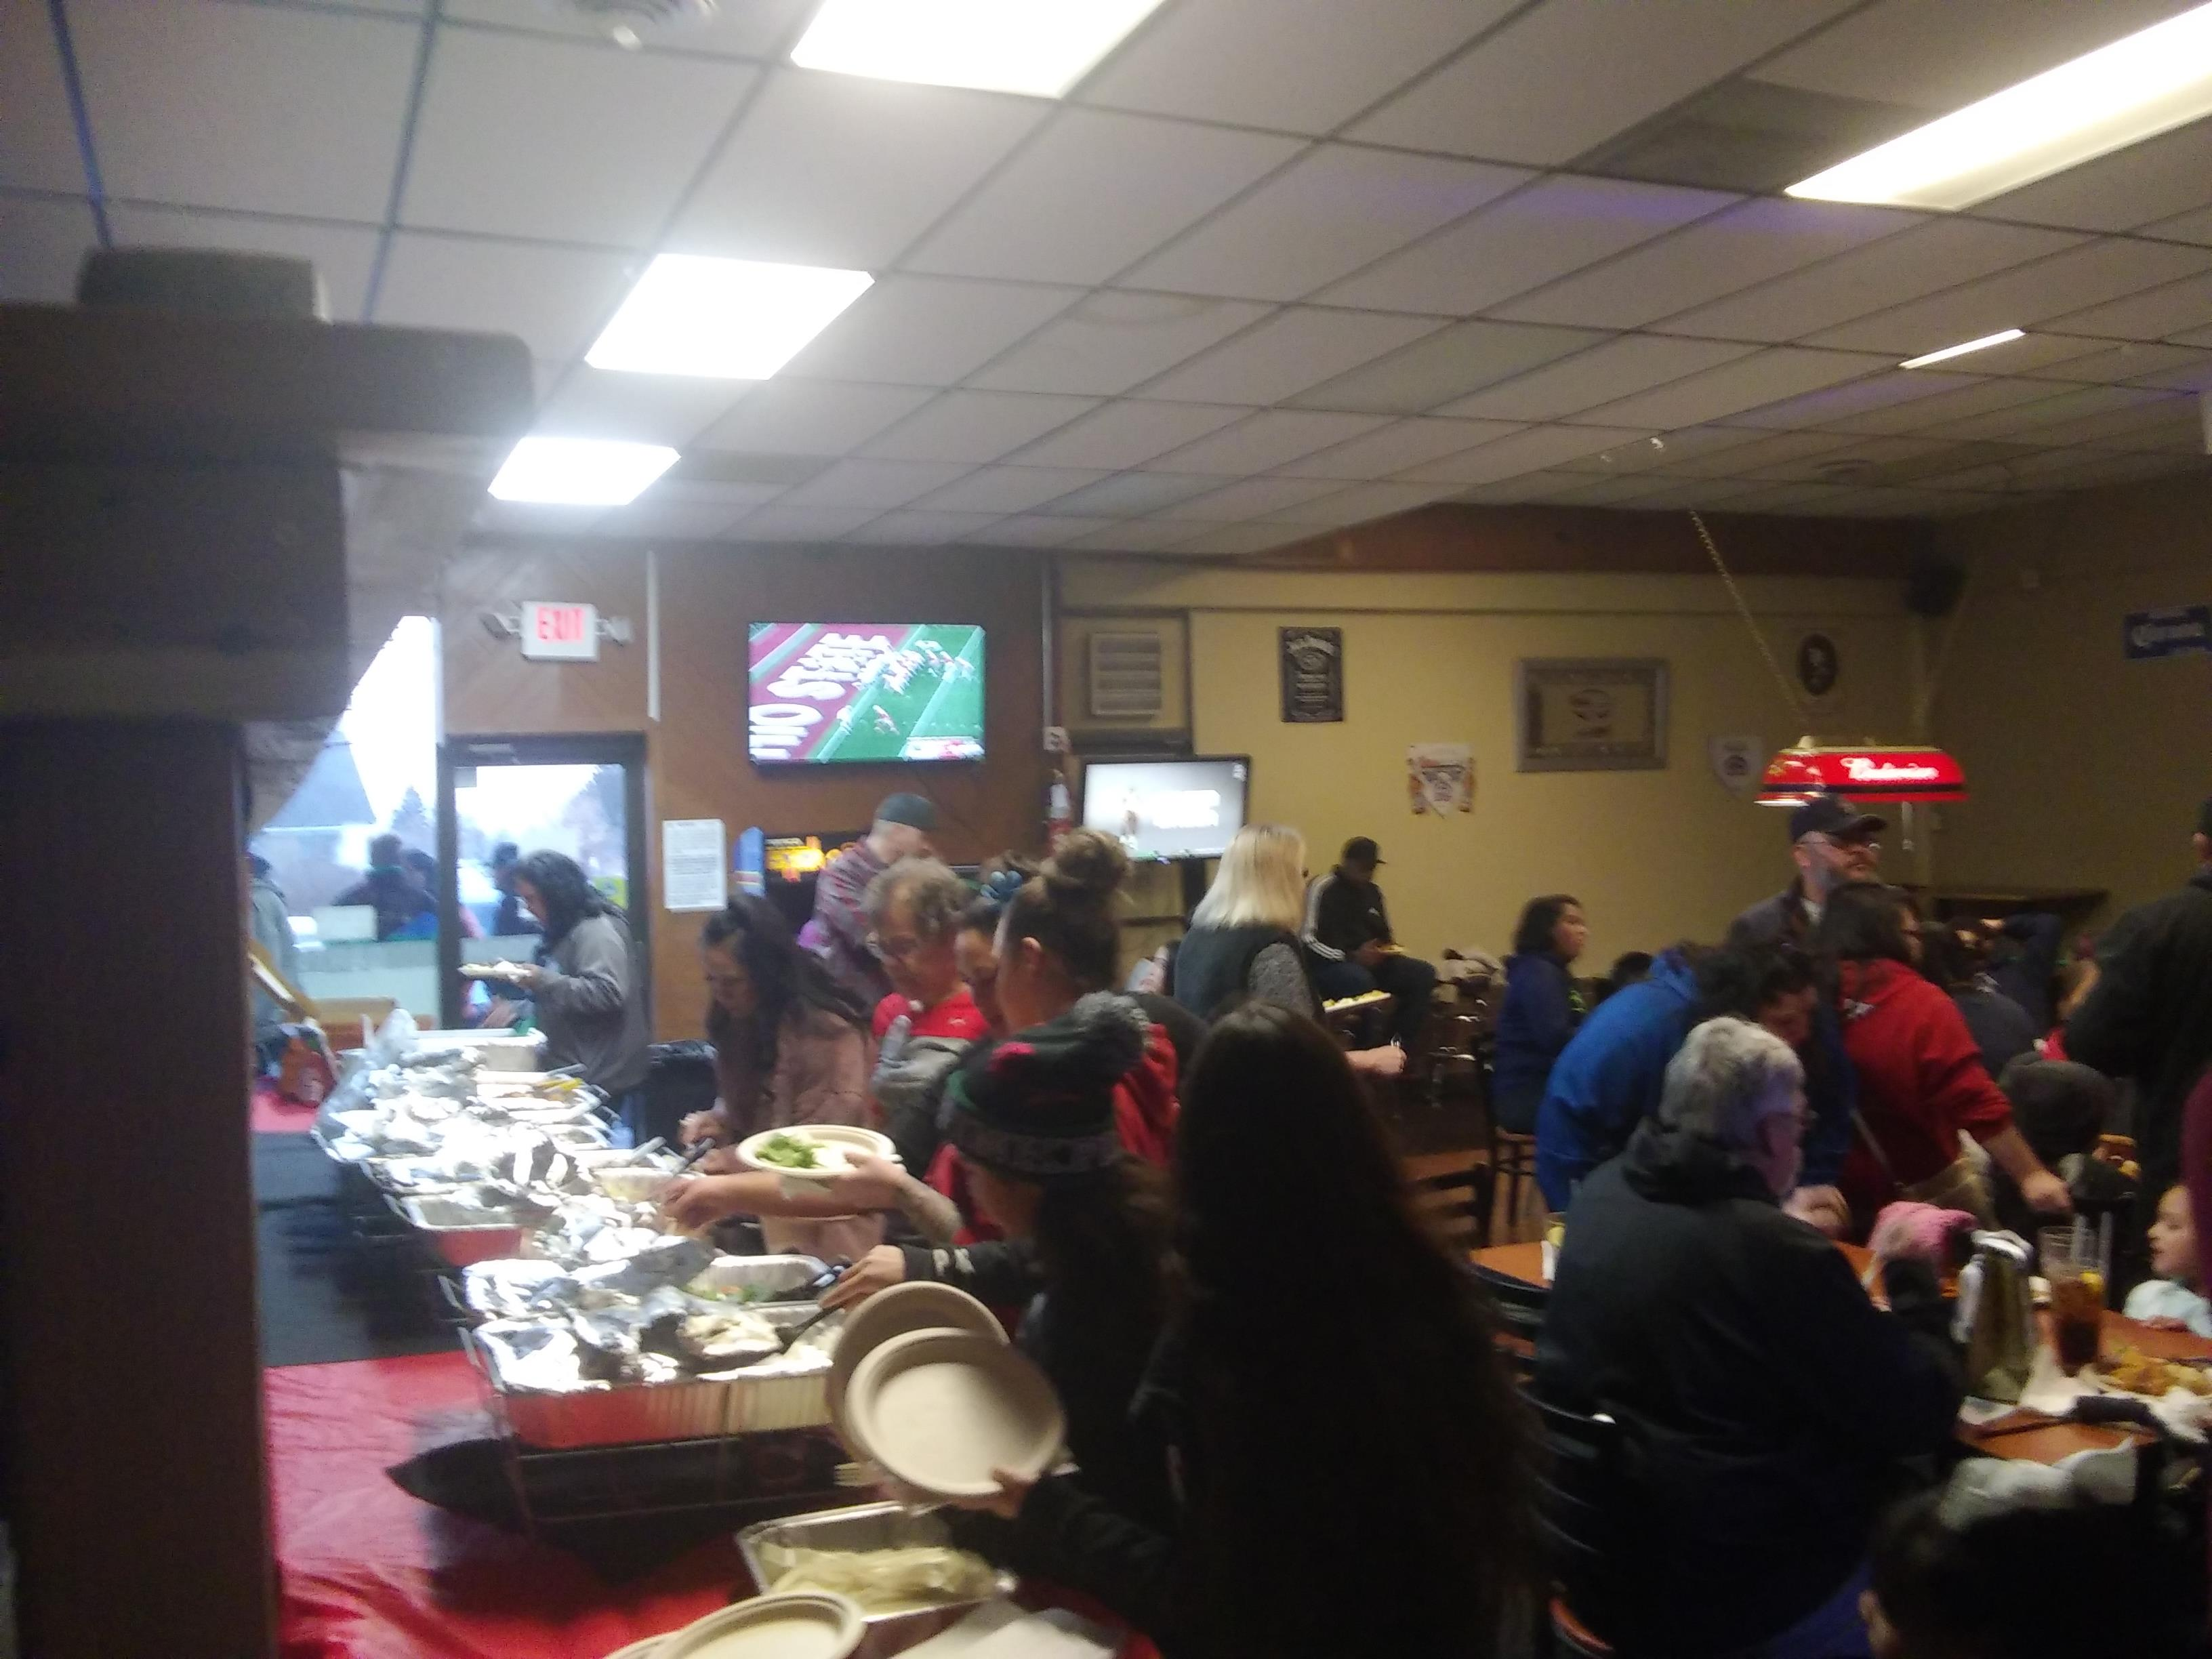 Heros pizzeria - Event room